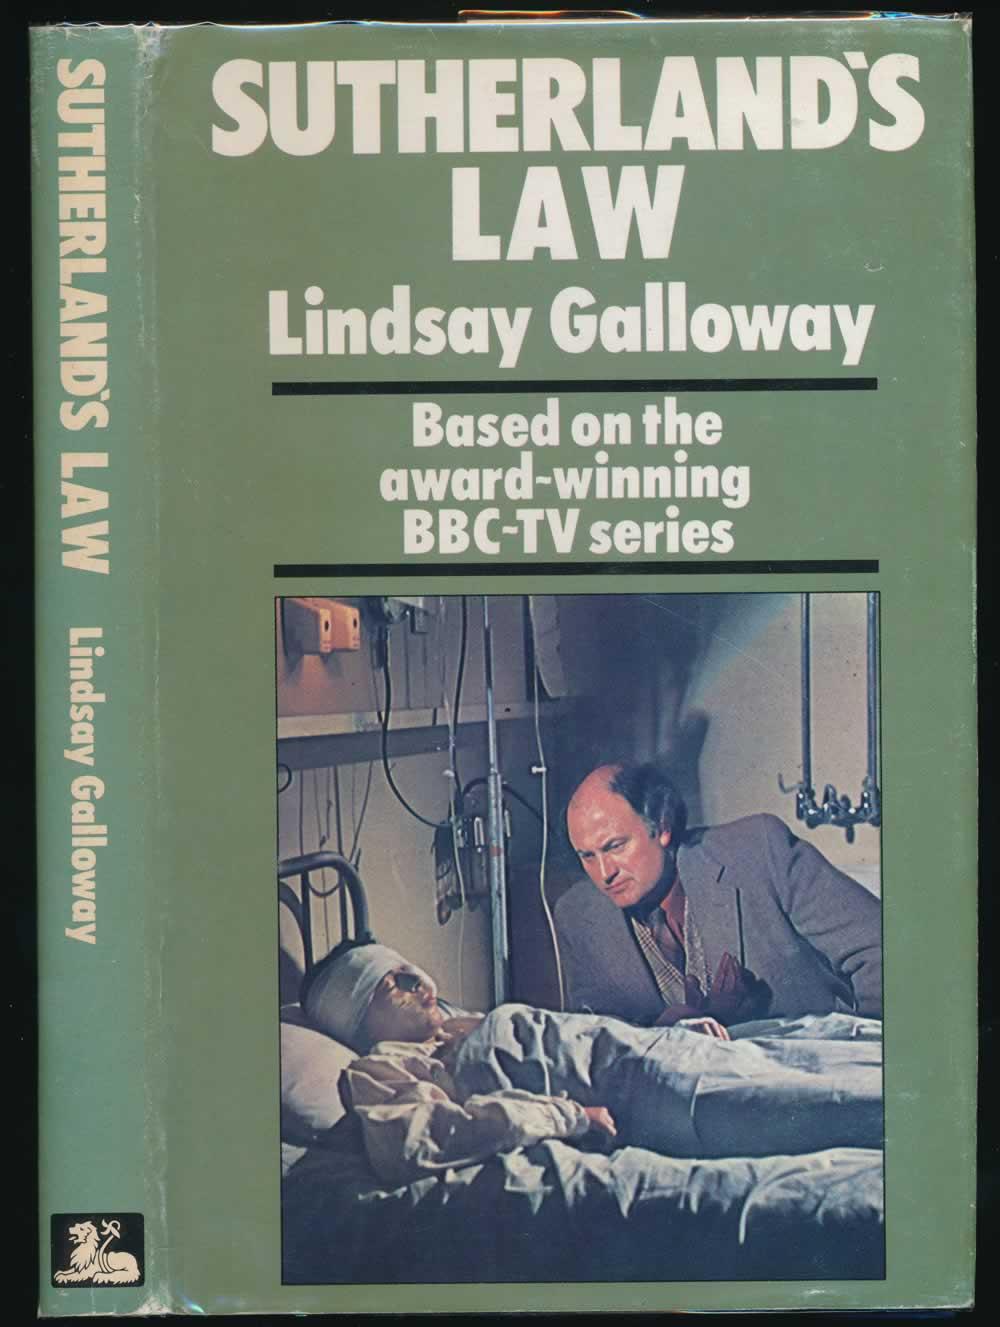 Sutherland's law